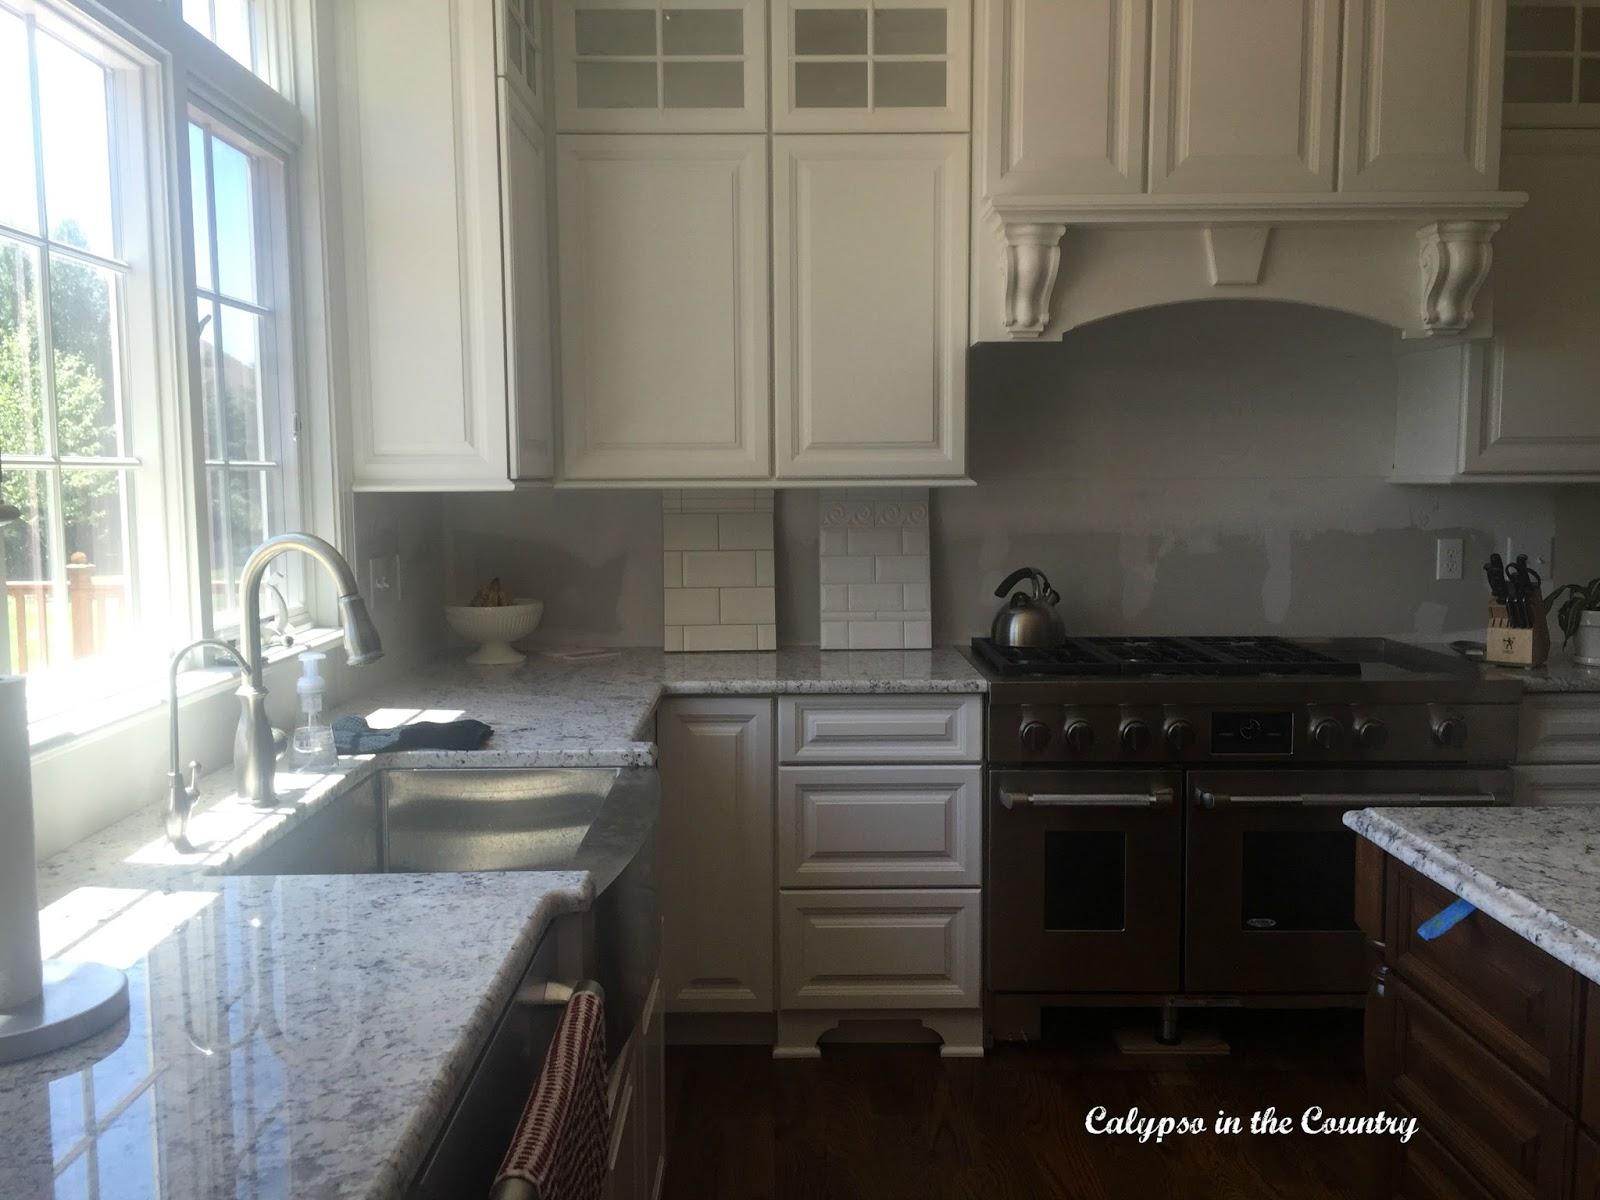 White Kitchen Renovation - choosing a backsplash